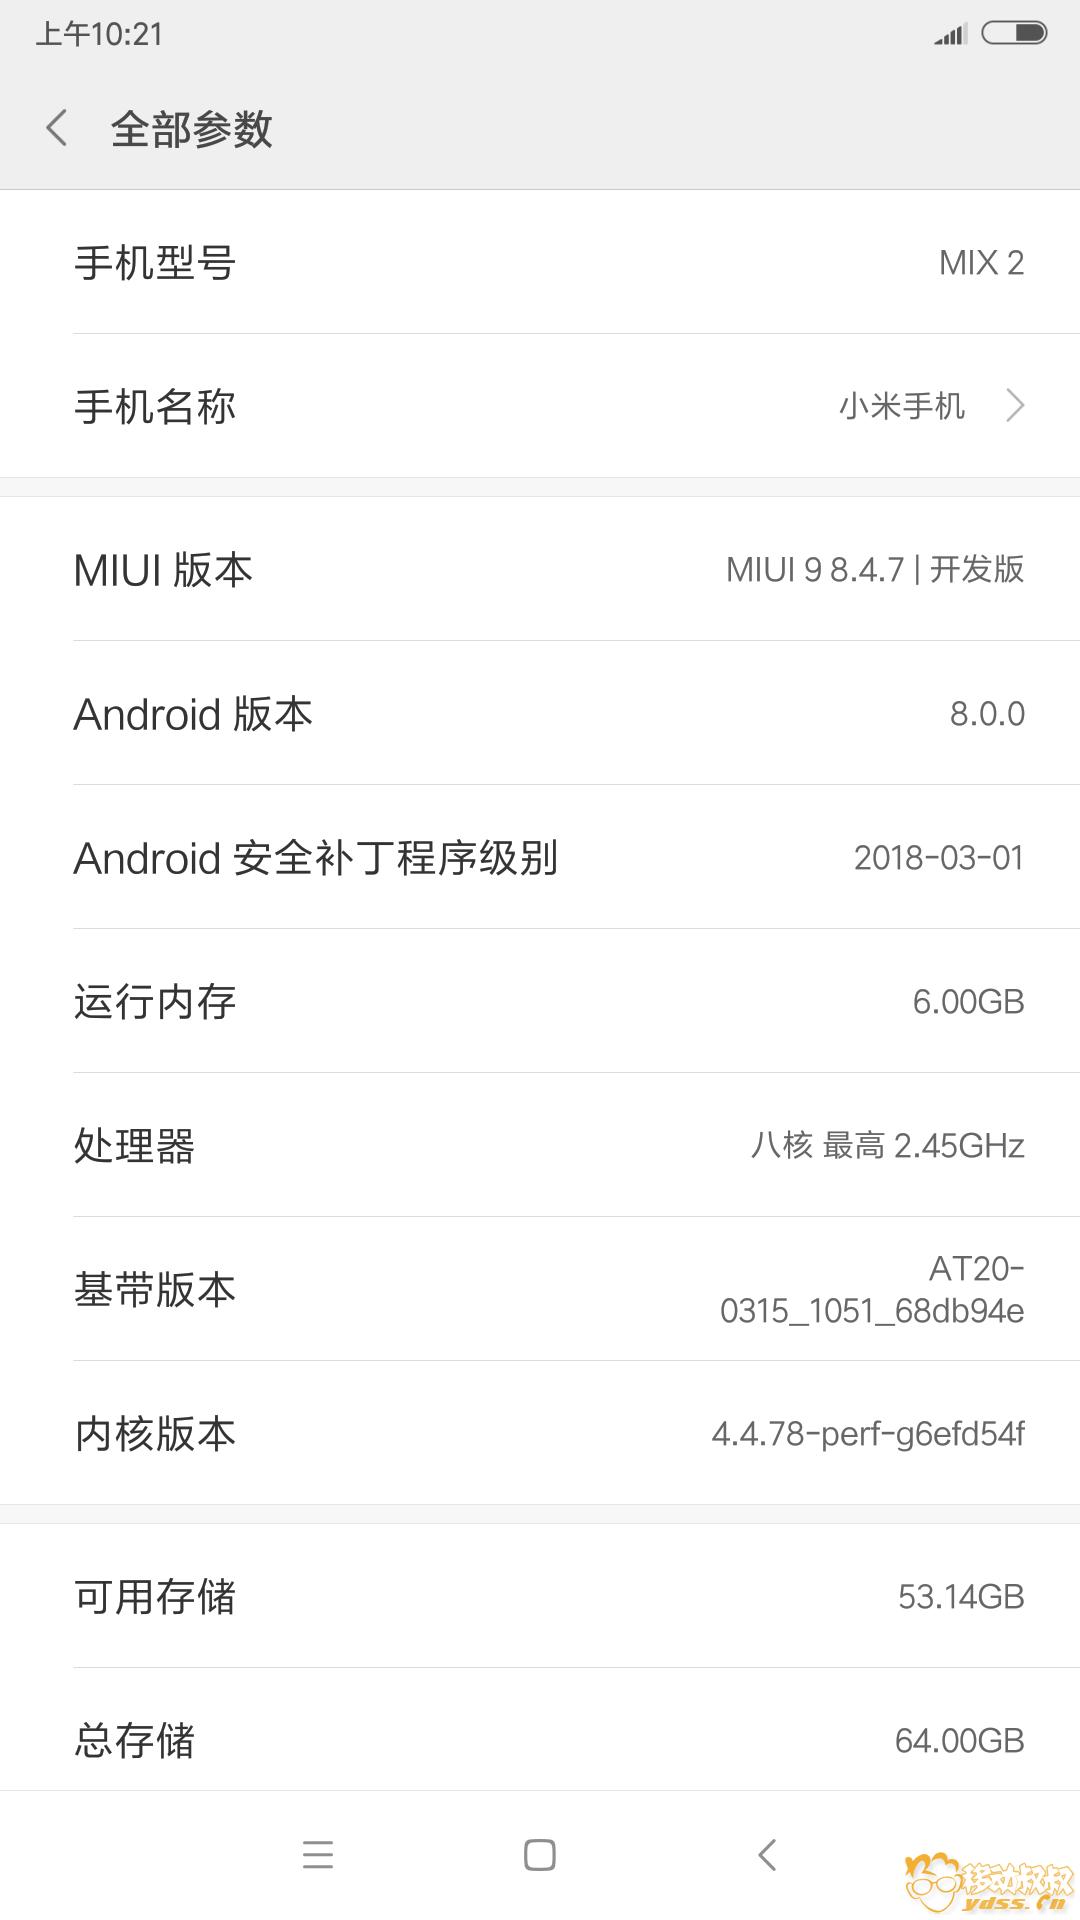 Screenshot_2018-04-07-10-21-15-136_com.android.settings.png